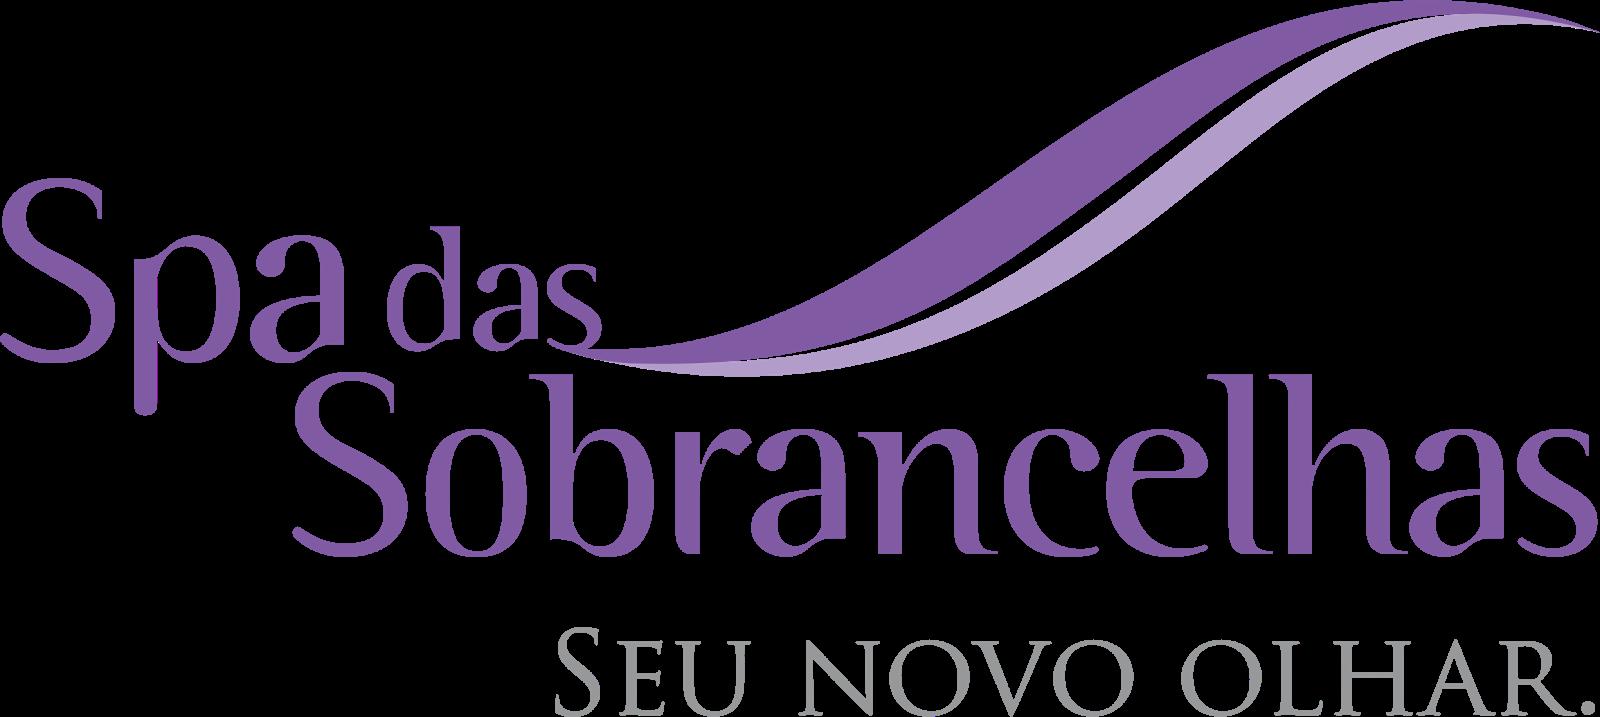 SPA DAS SOBRANCELHAS | Núcleo Bandeirante